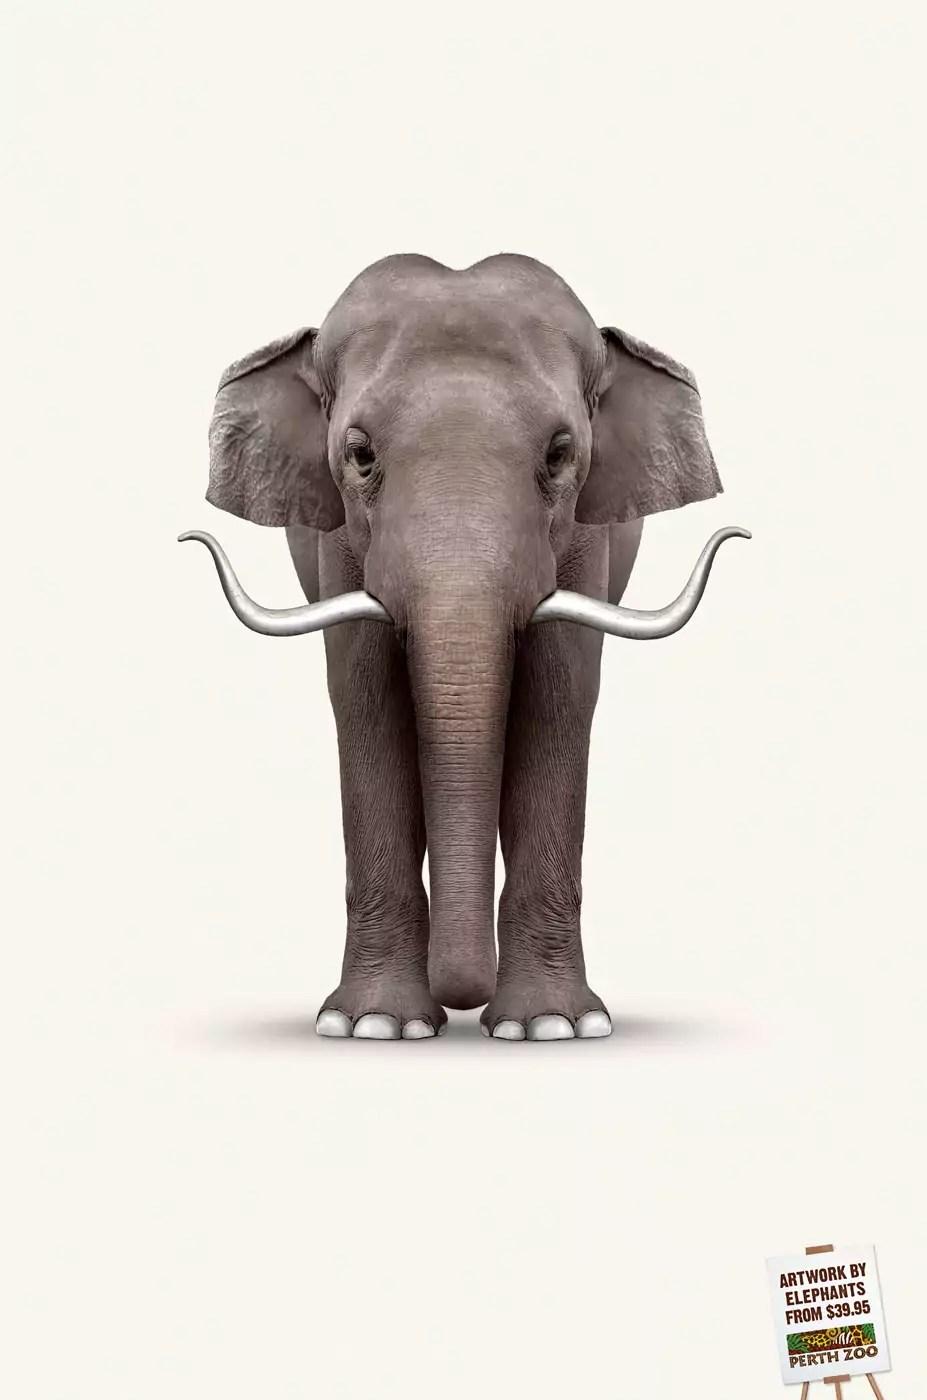 Perth Zoo — Elephant Art: Dali